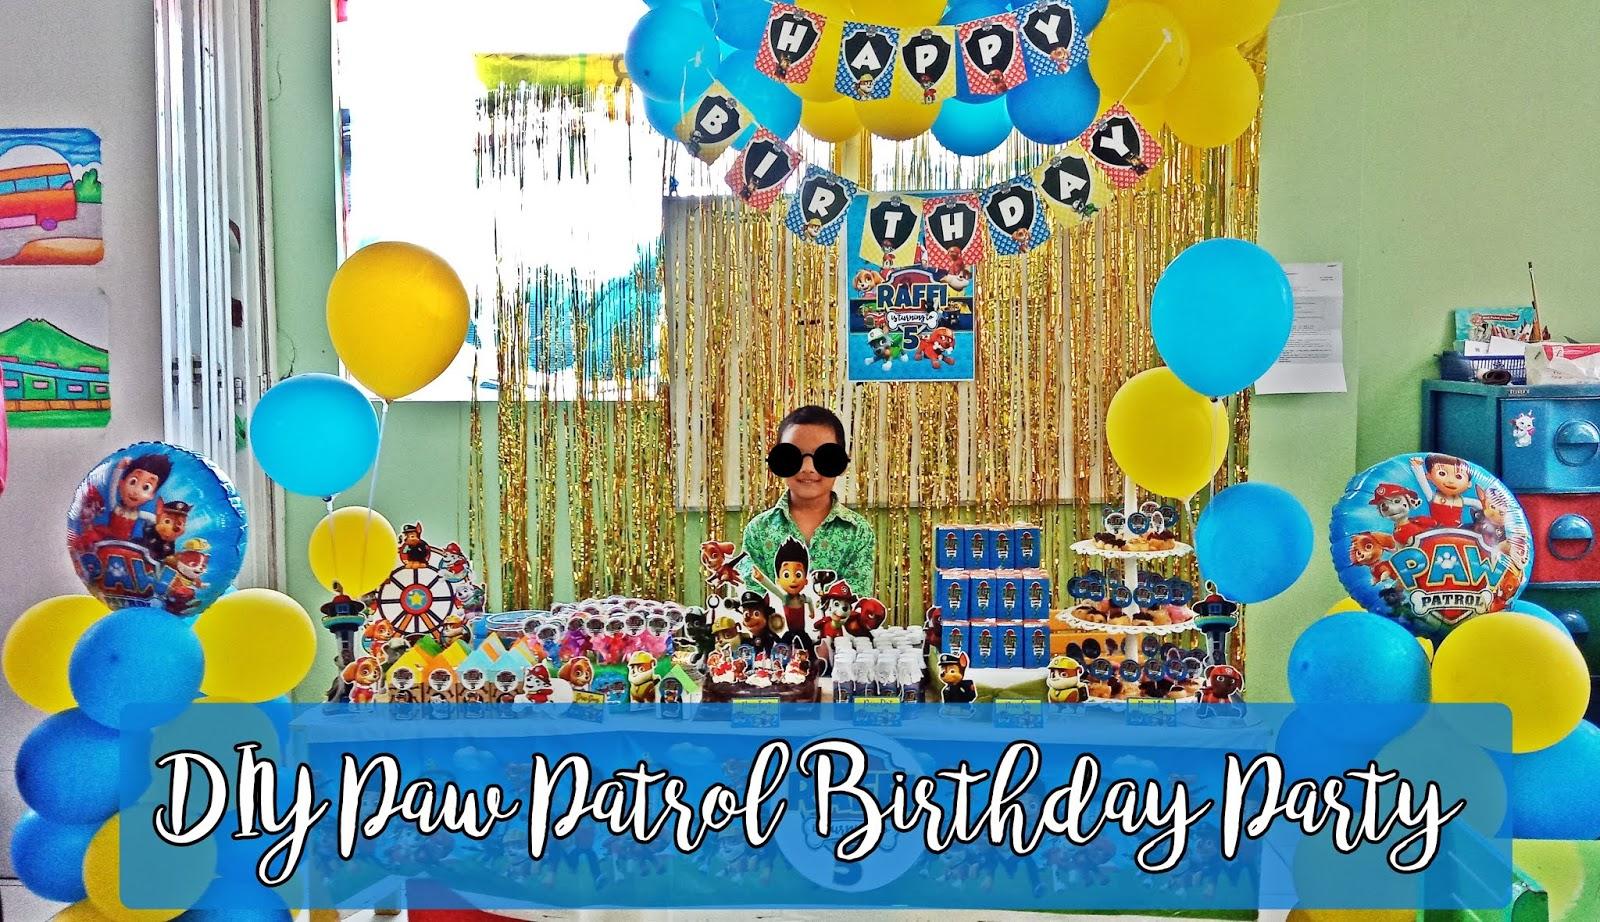 Cerita Cha Ultah Raffi Ke 5 Diy Paw Patrol Birthday Party